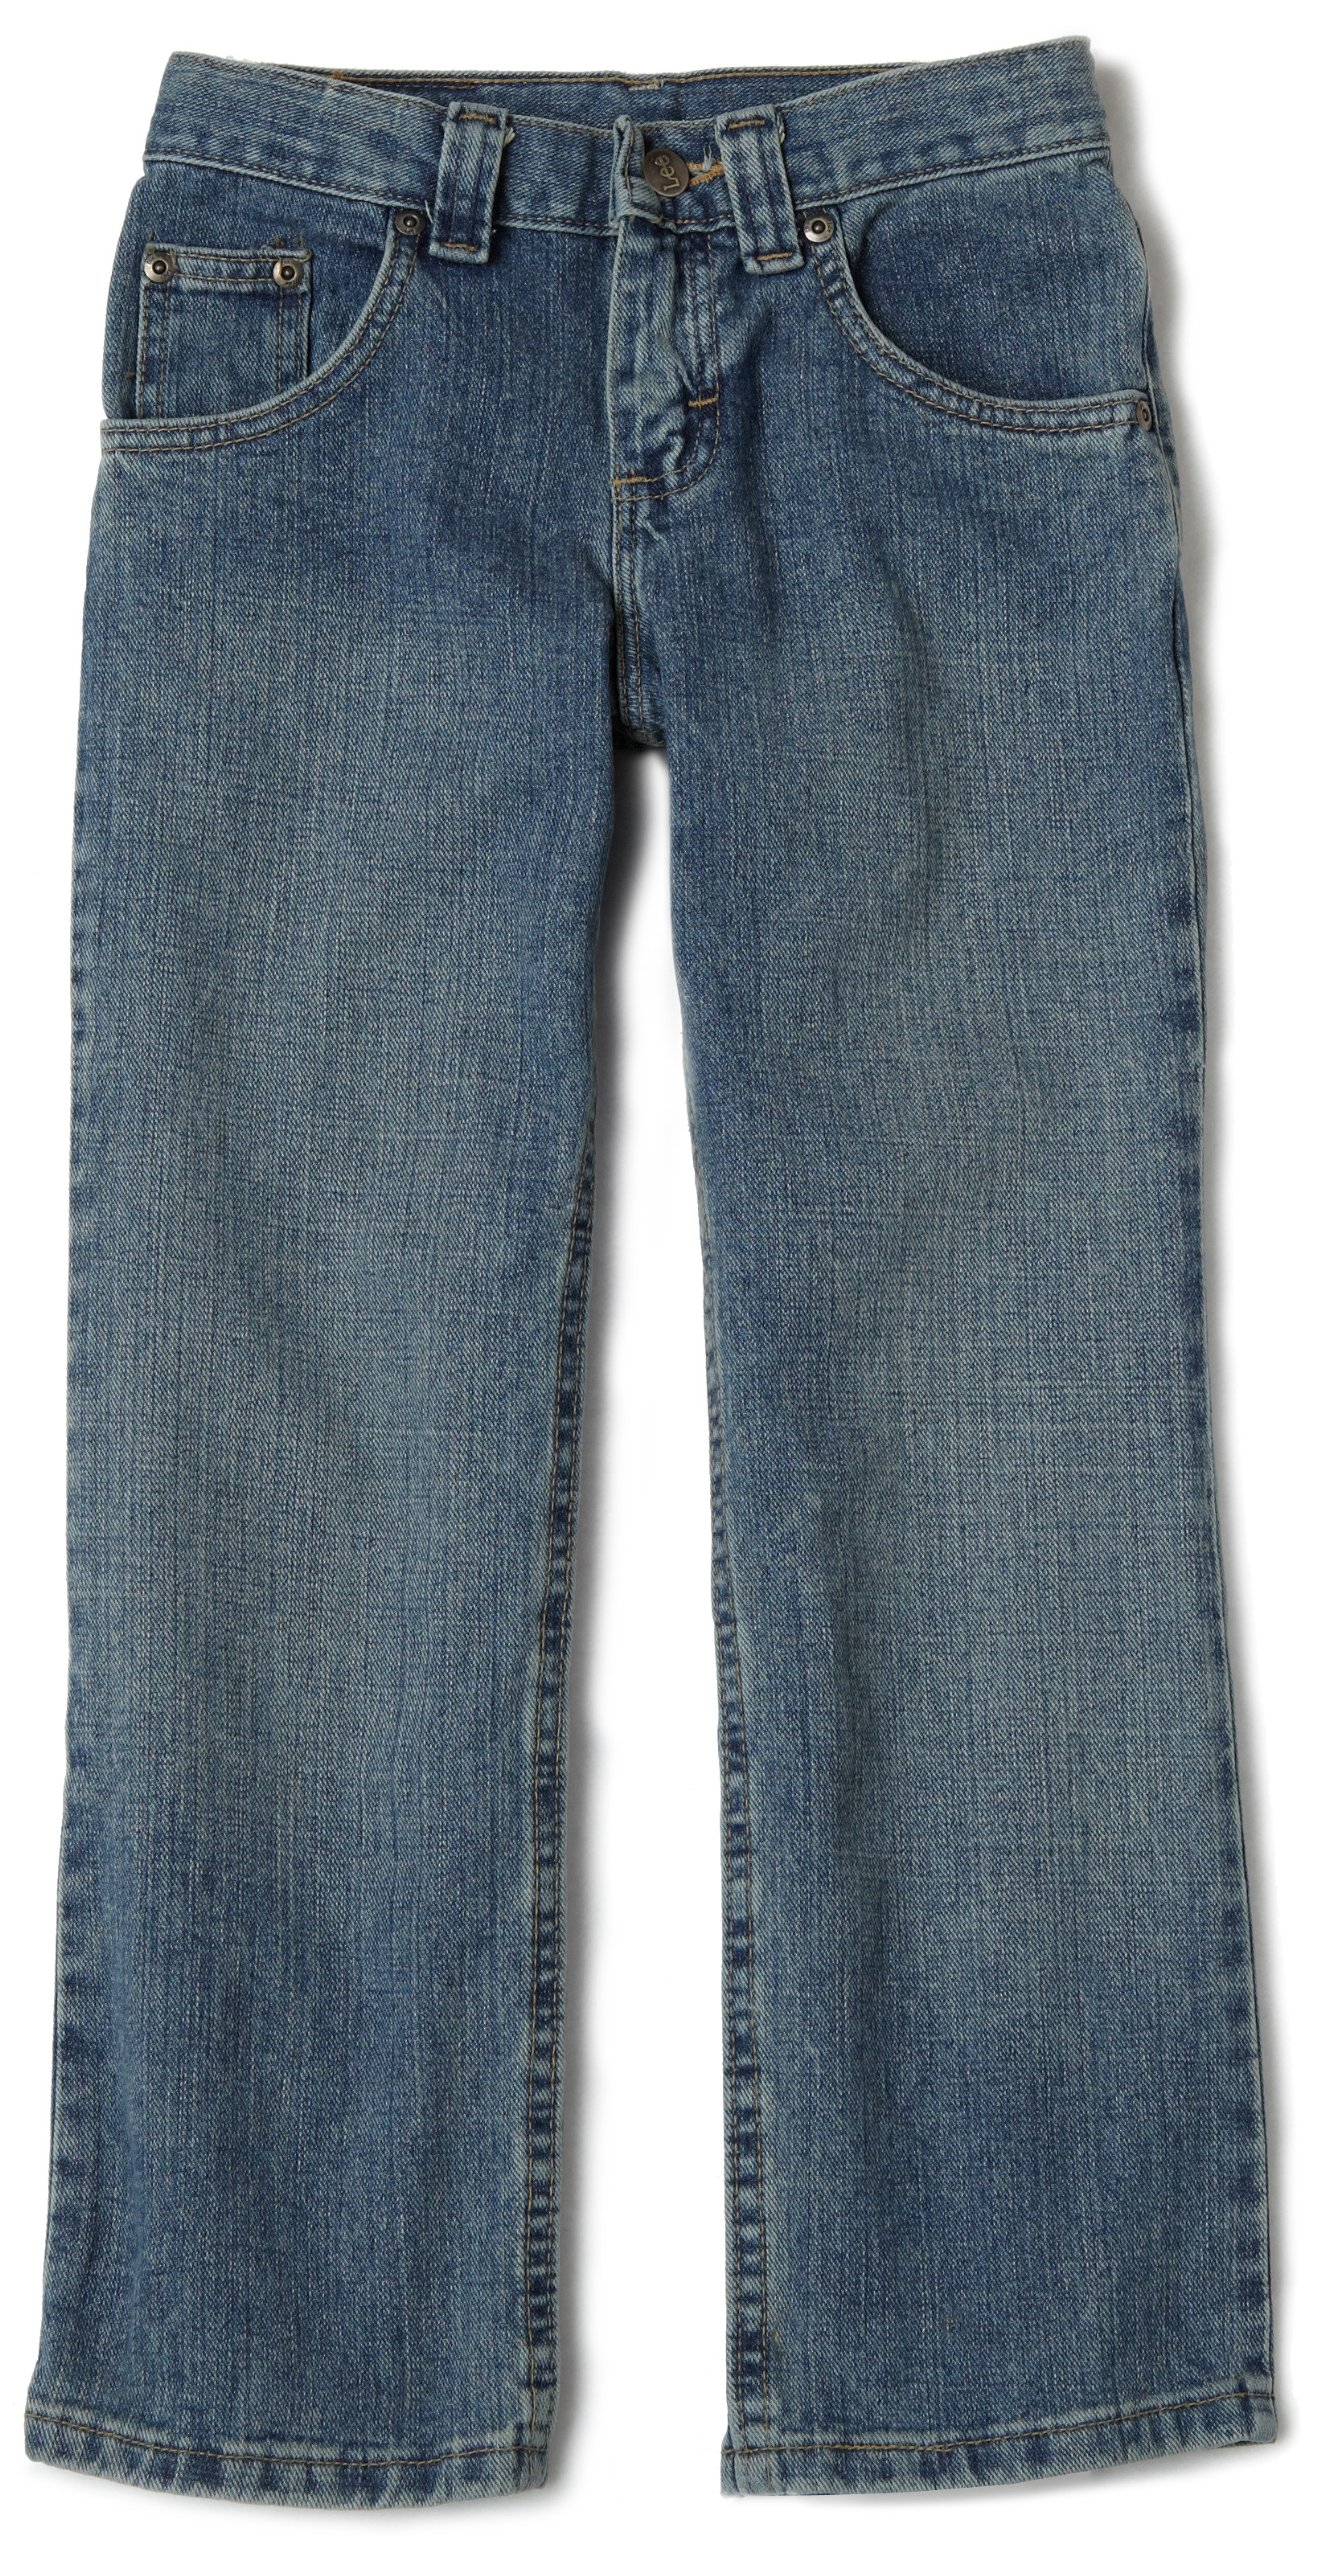 LEE Big Boys' Relaxed Fit Straight Leg Jeans,Worn Handsand,18 Slim